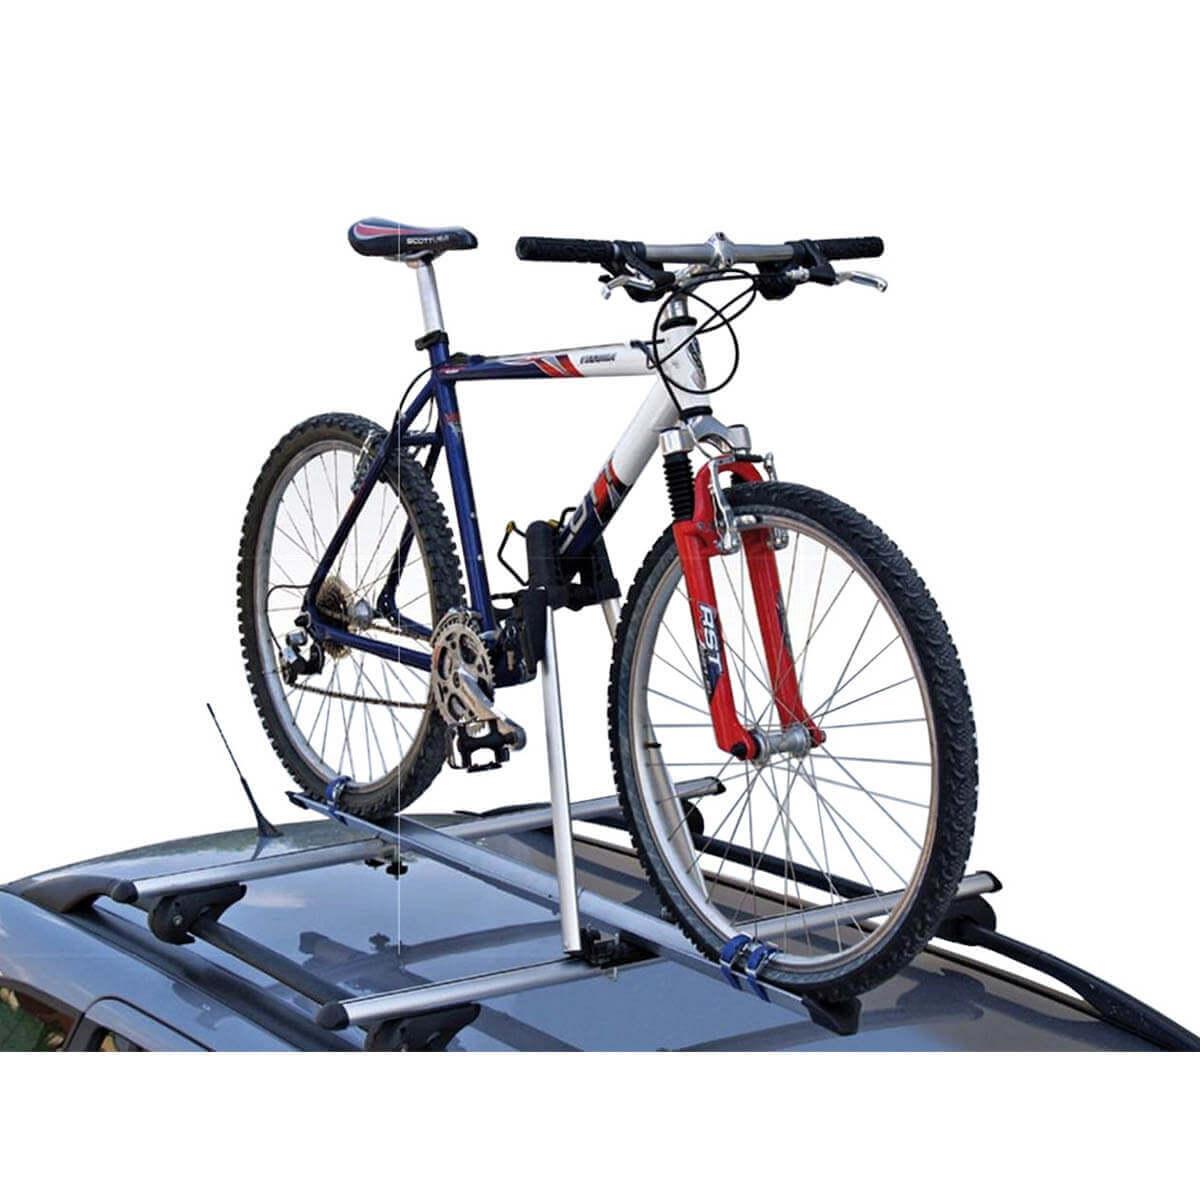 Rack de teto para bicicleta em alumínio Kiussi Tonale